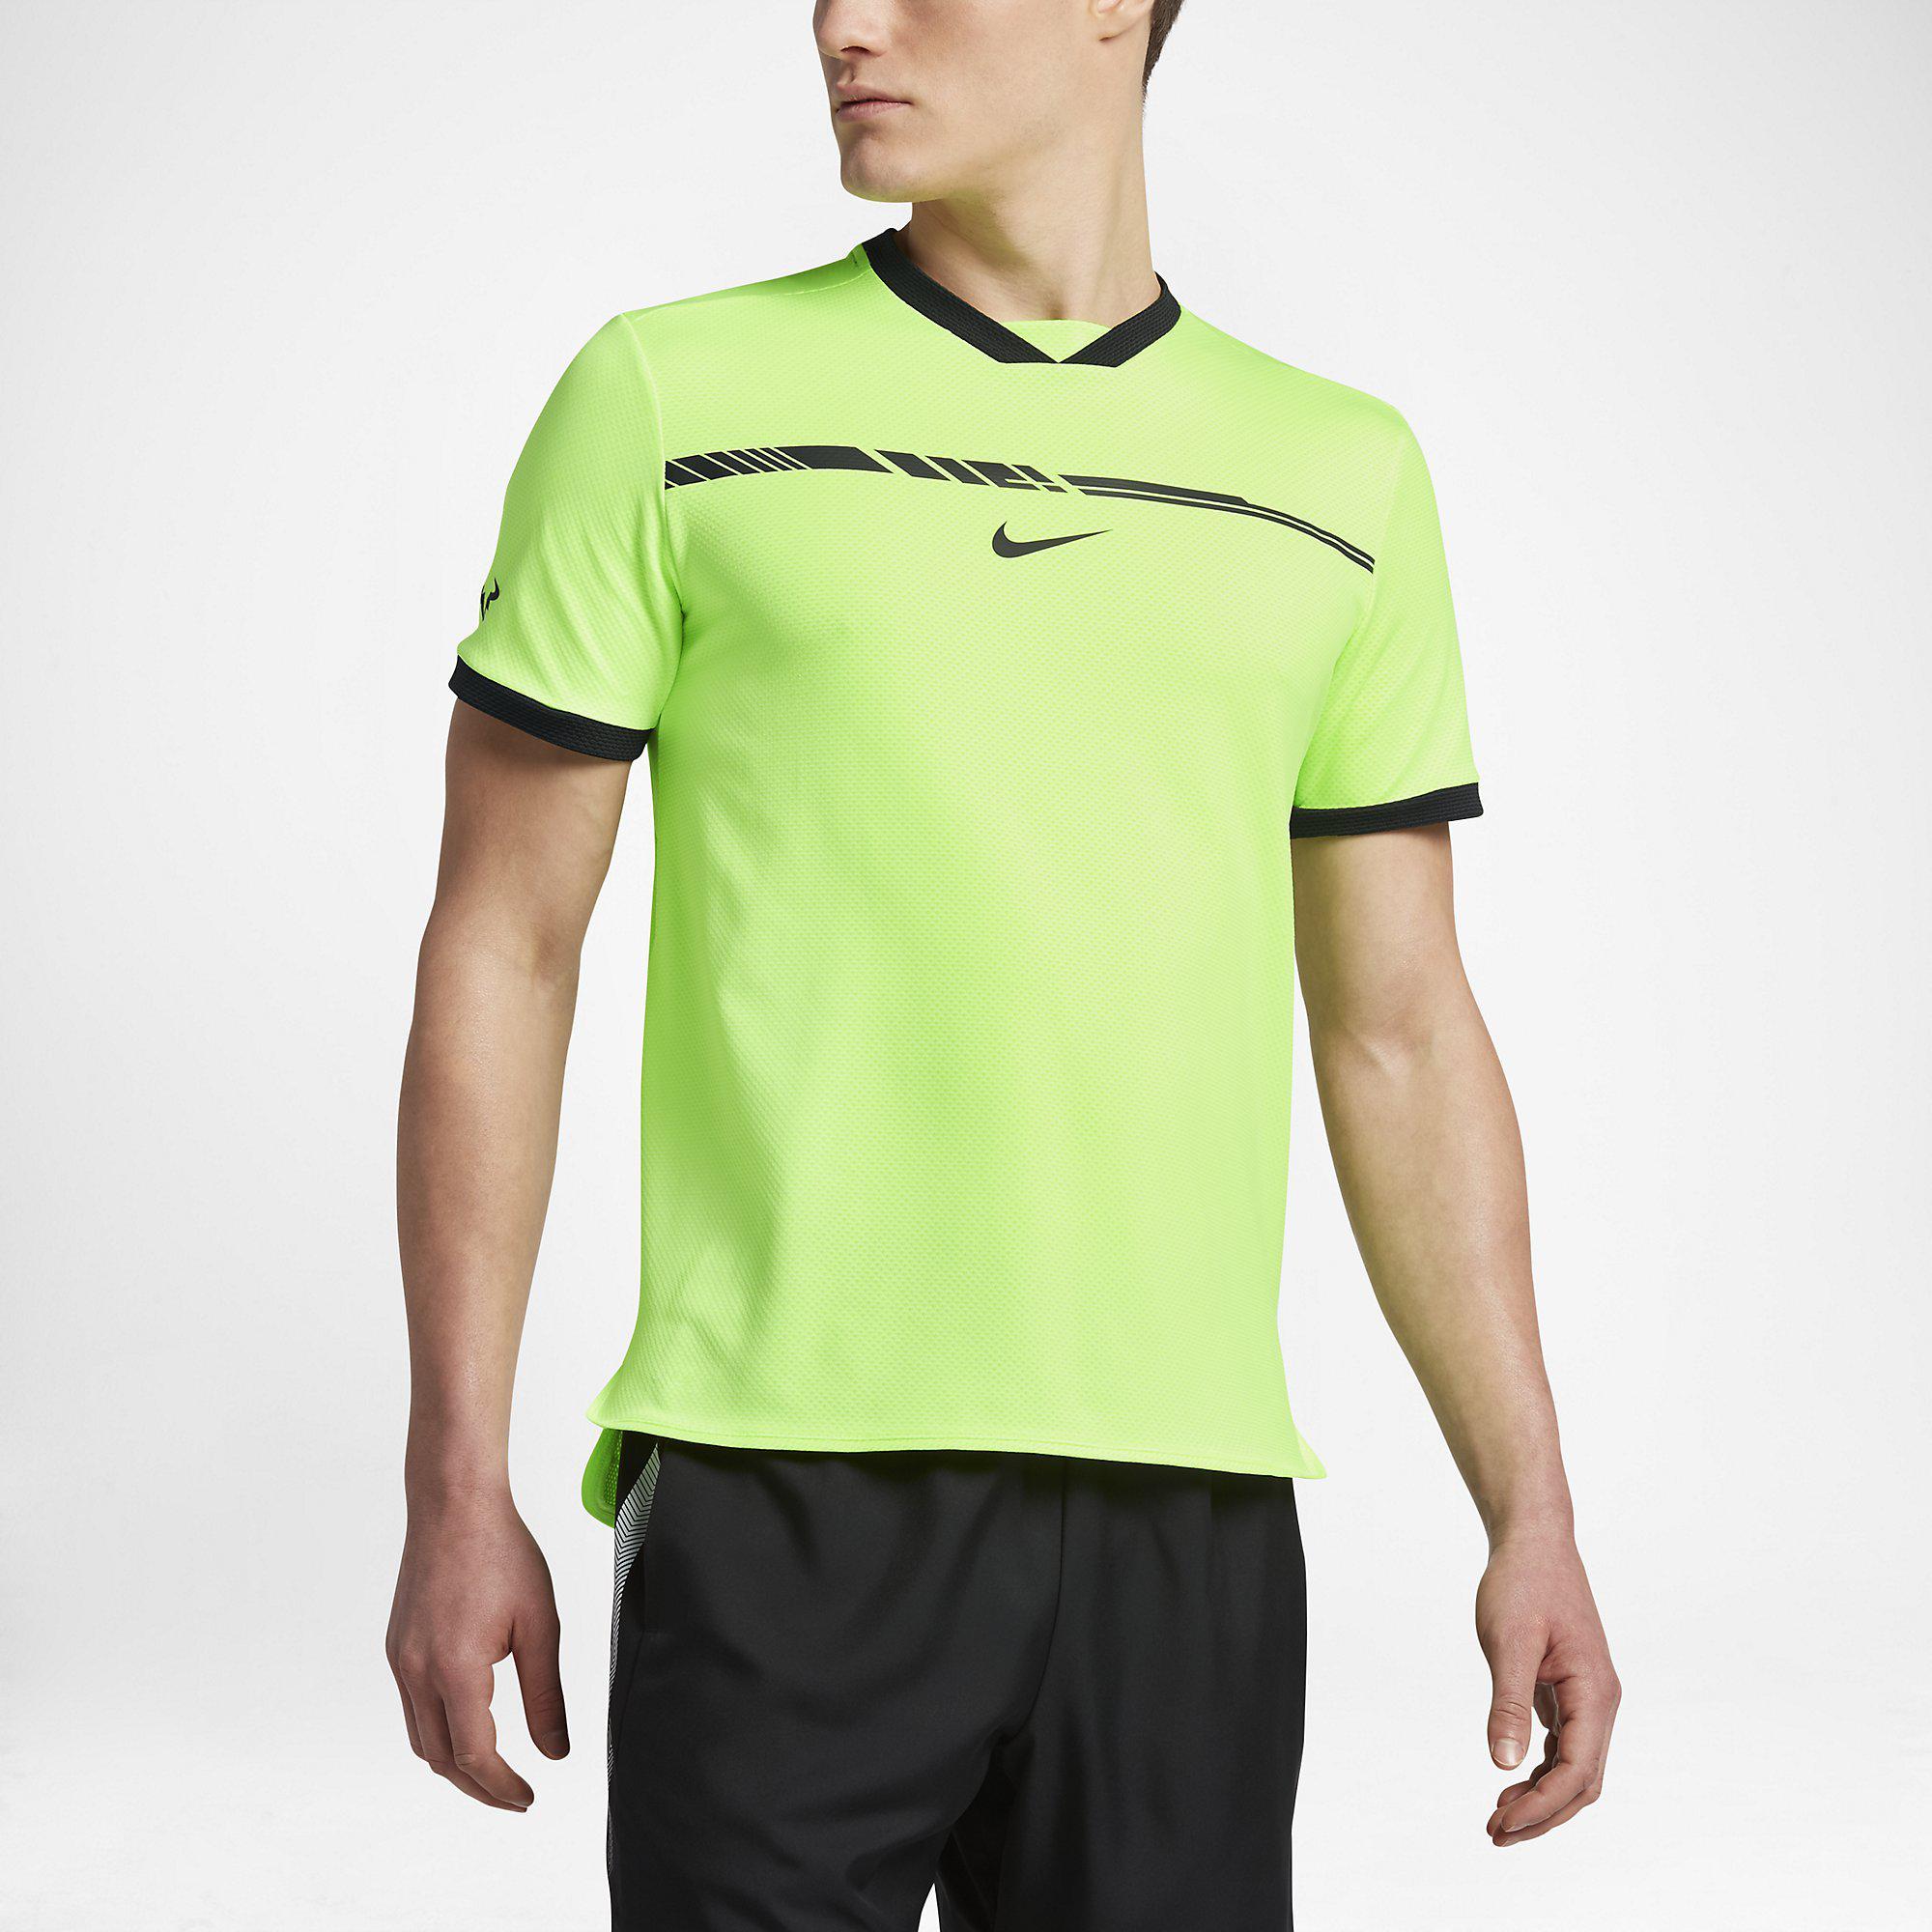 Nike Mens AeroReact Rafa Challenger Top - Ghost Green/Black